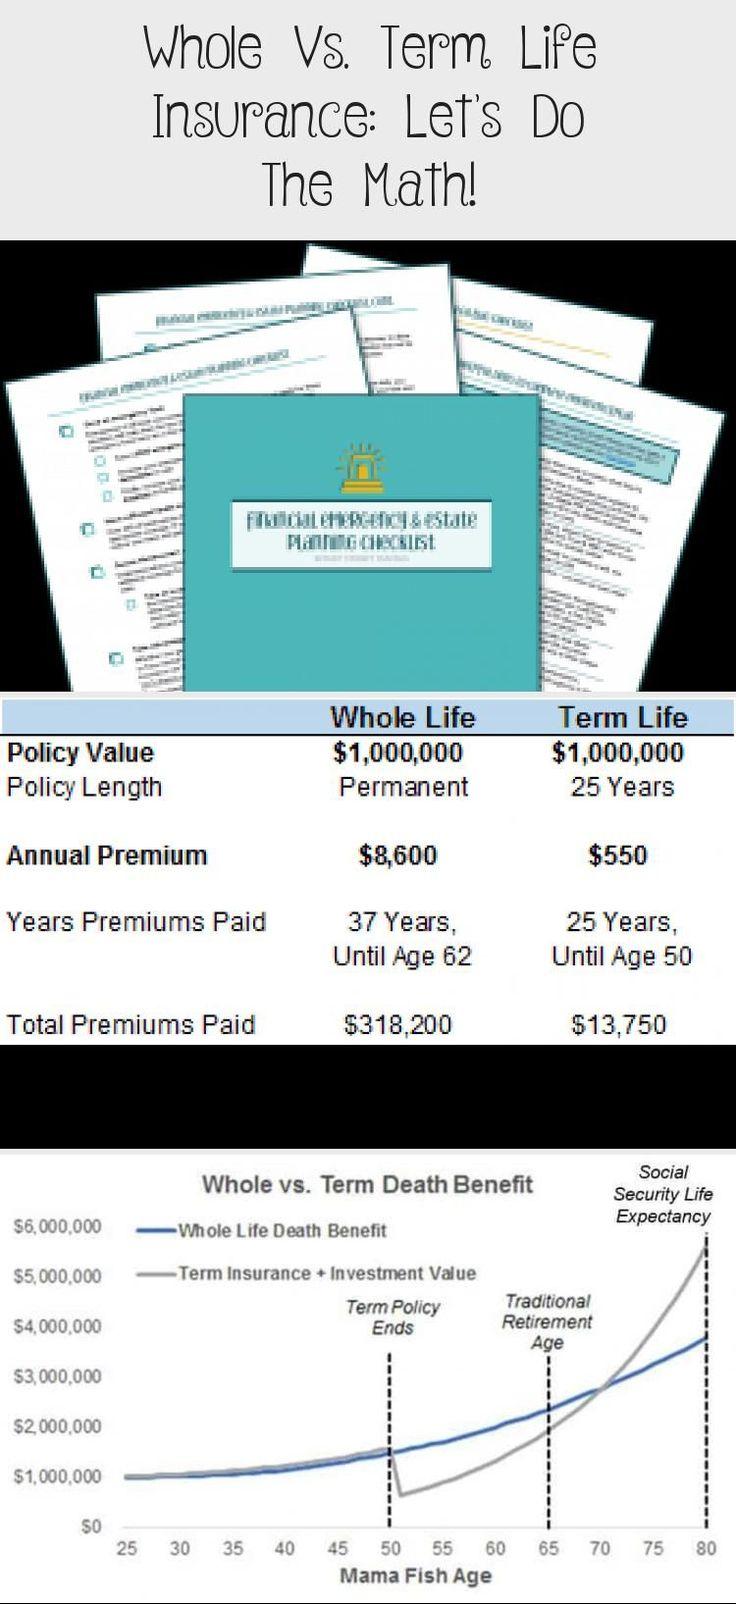 Whole Vs Term Life Insurance Let S Do The Math Smart Money